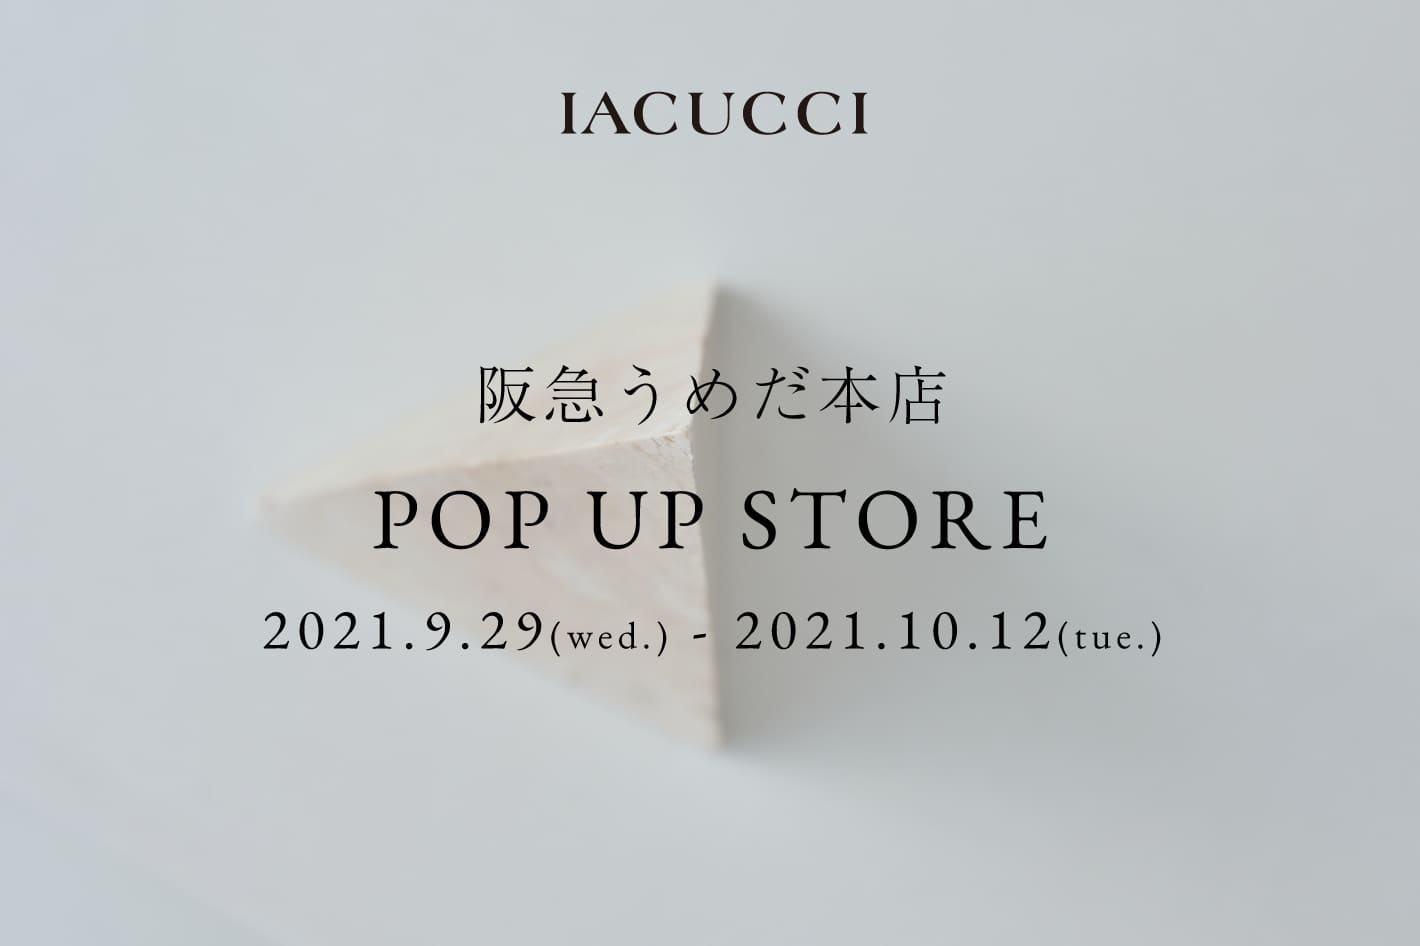 IACUCCI <予告>阪急うめだ本店 期間限定POP-UP STOREオープンのお知らせ